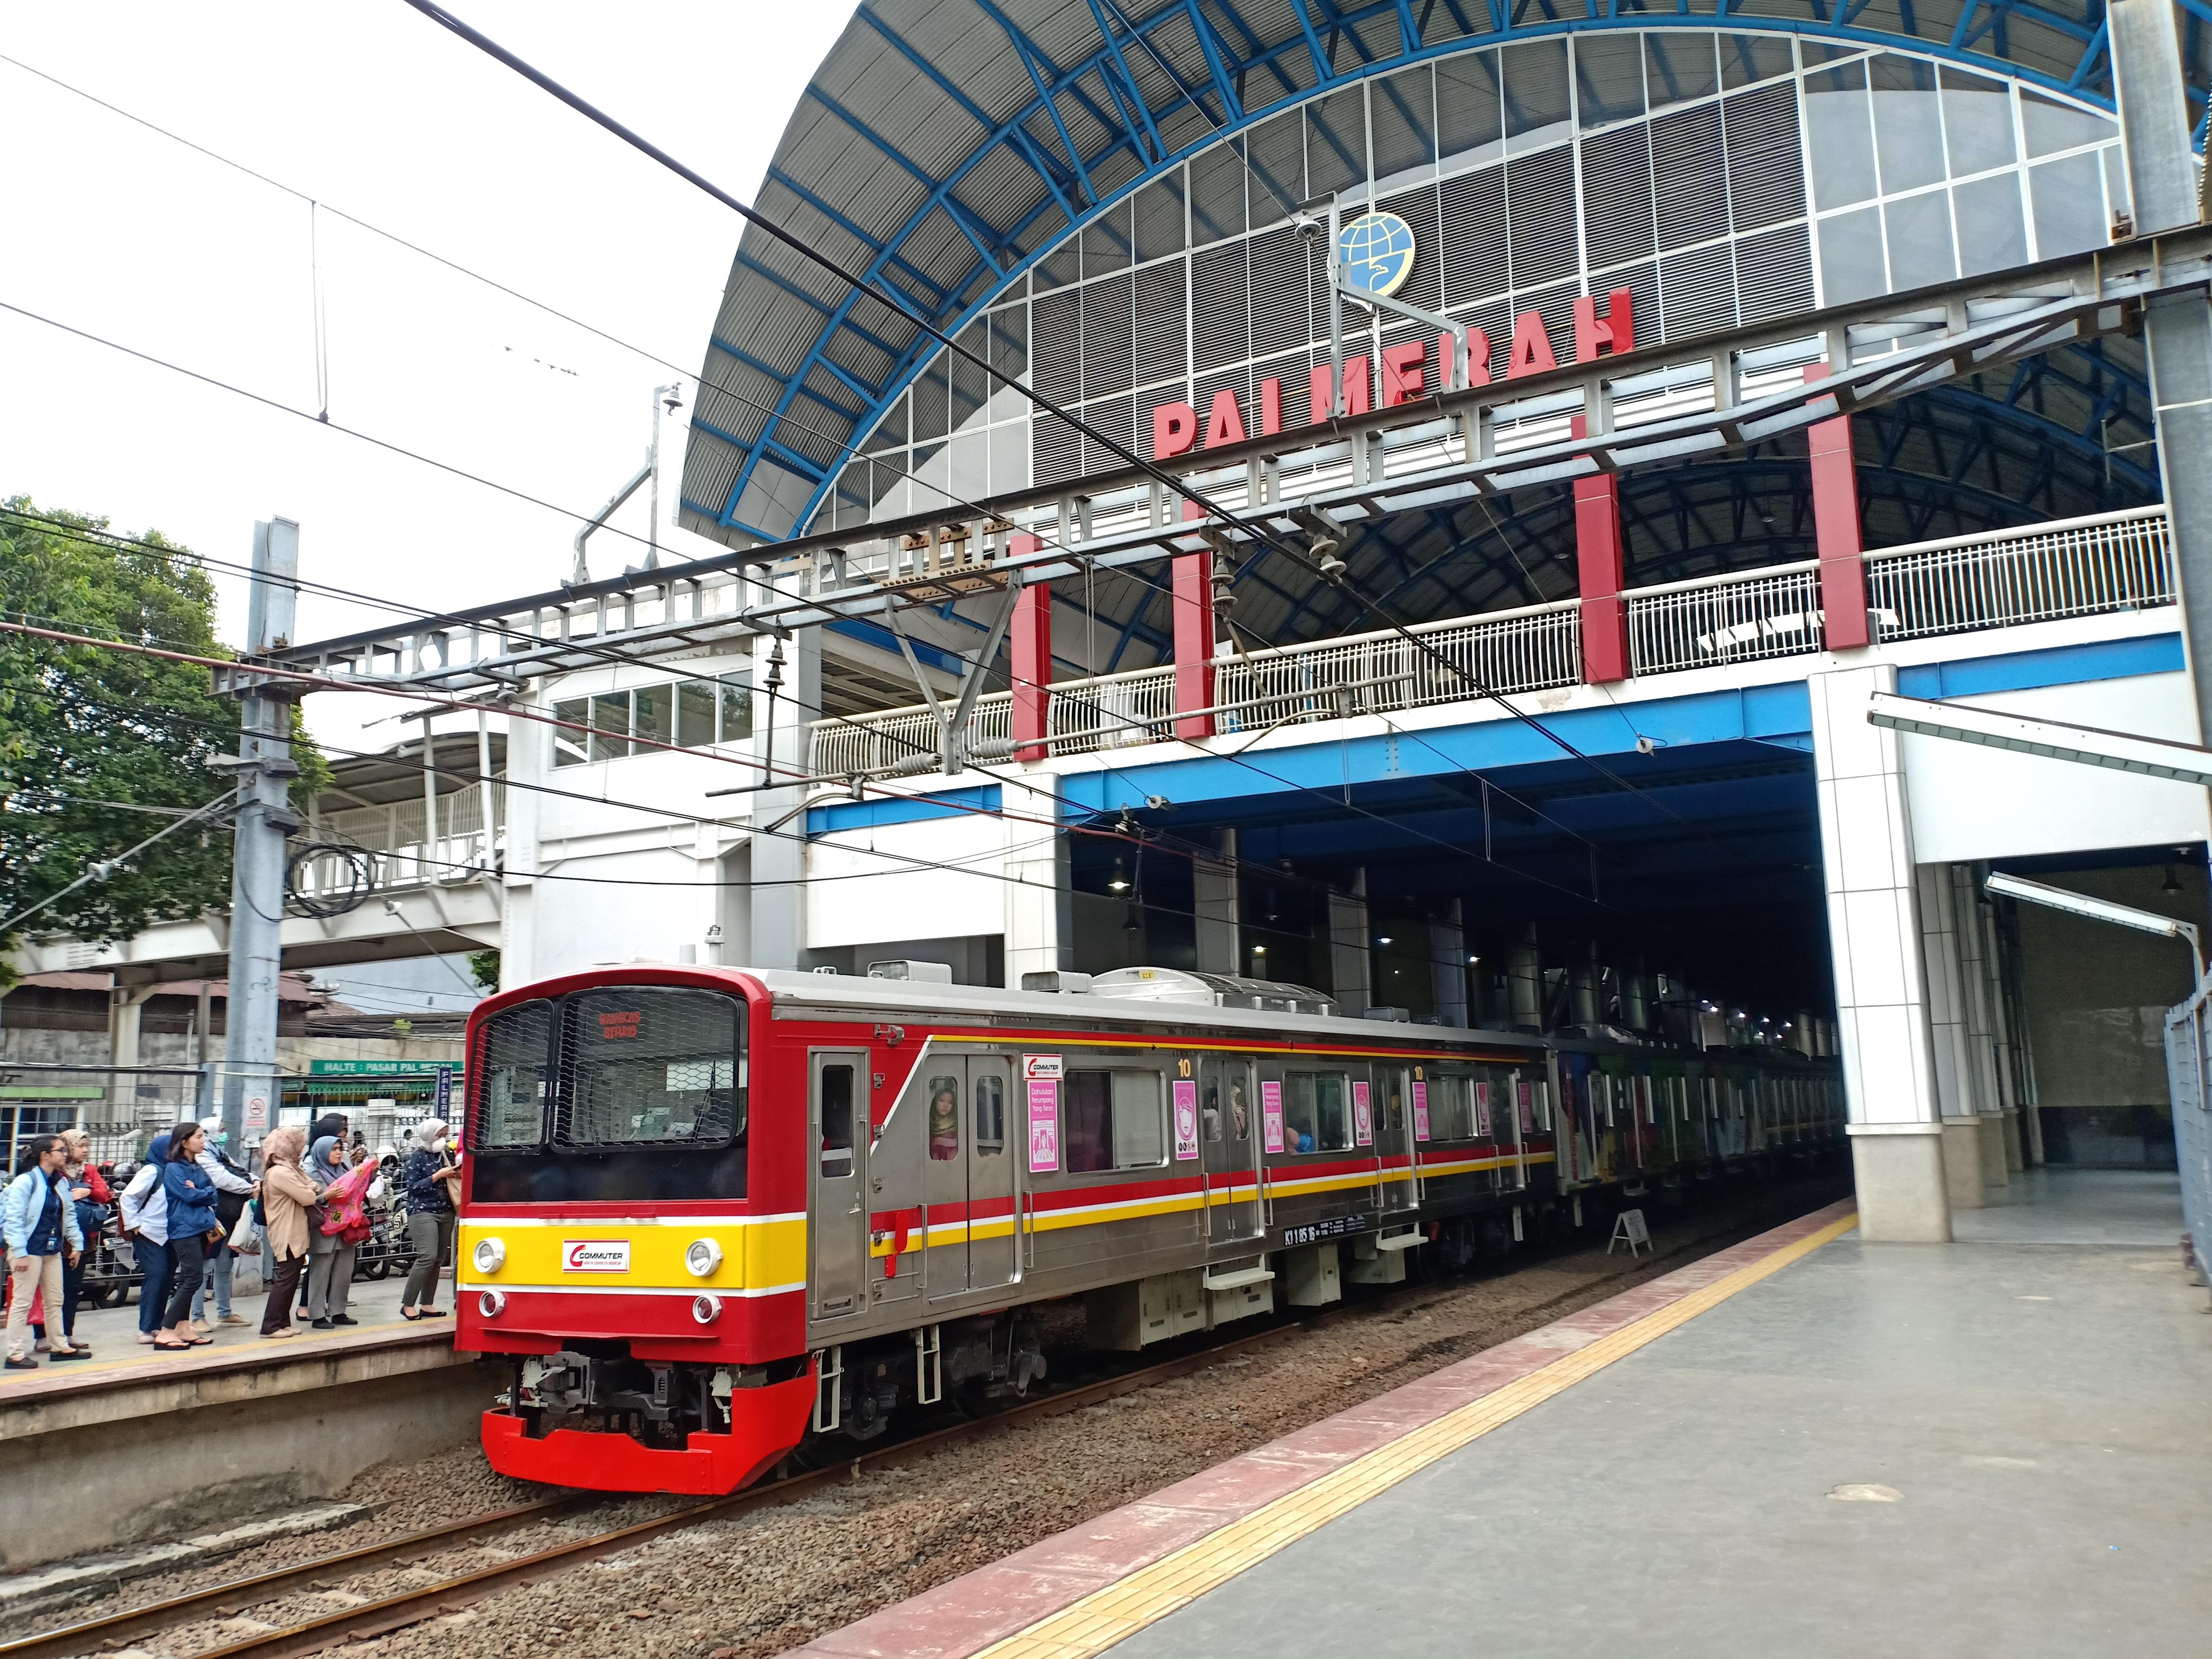 Stasiun Palmerah Wikipedia Bahasa Indonesia Ensiklopedia Bebas